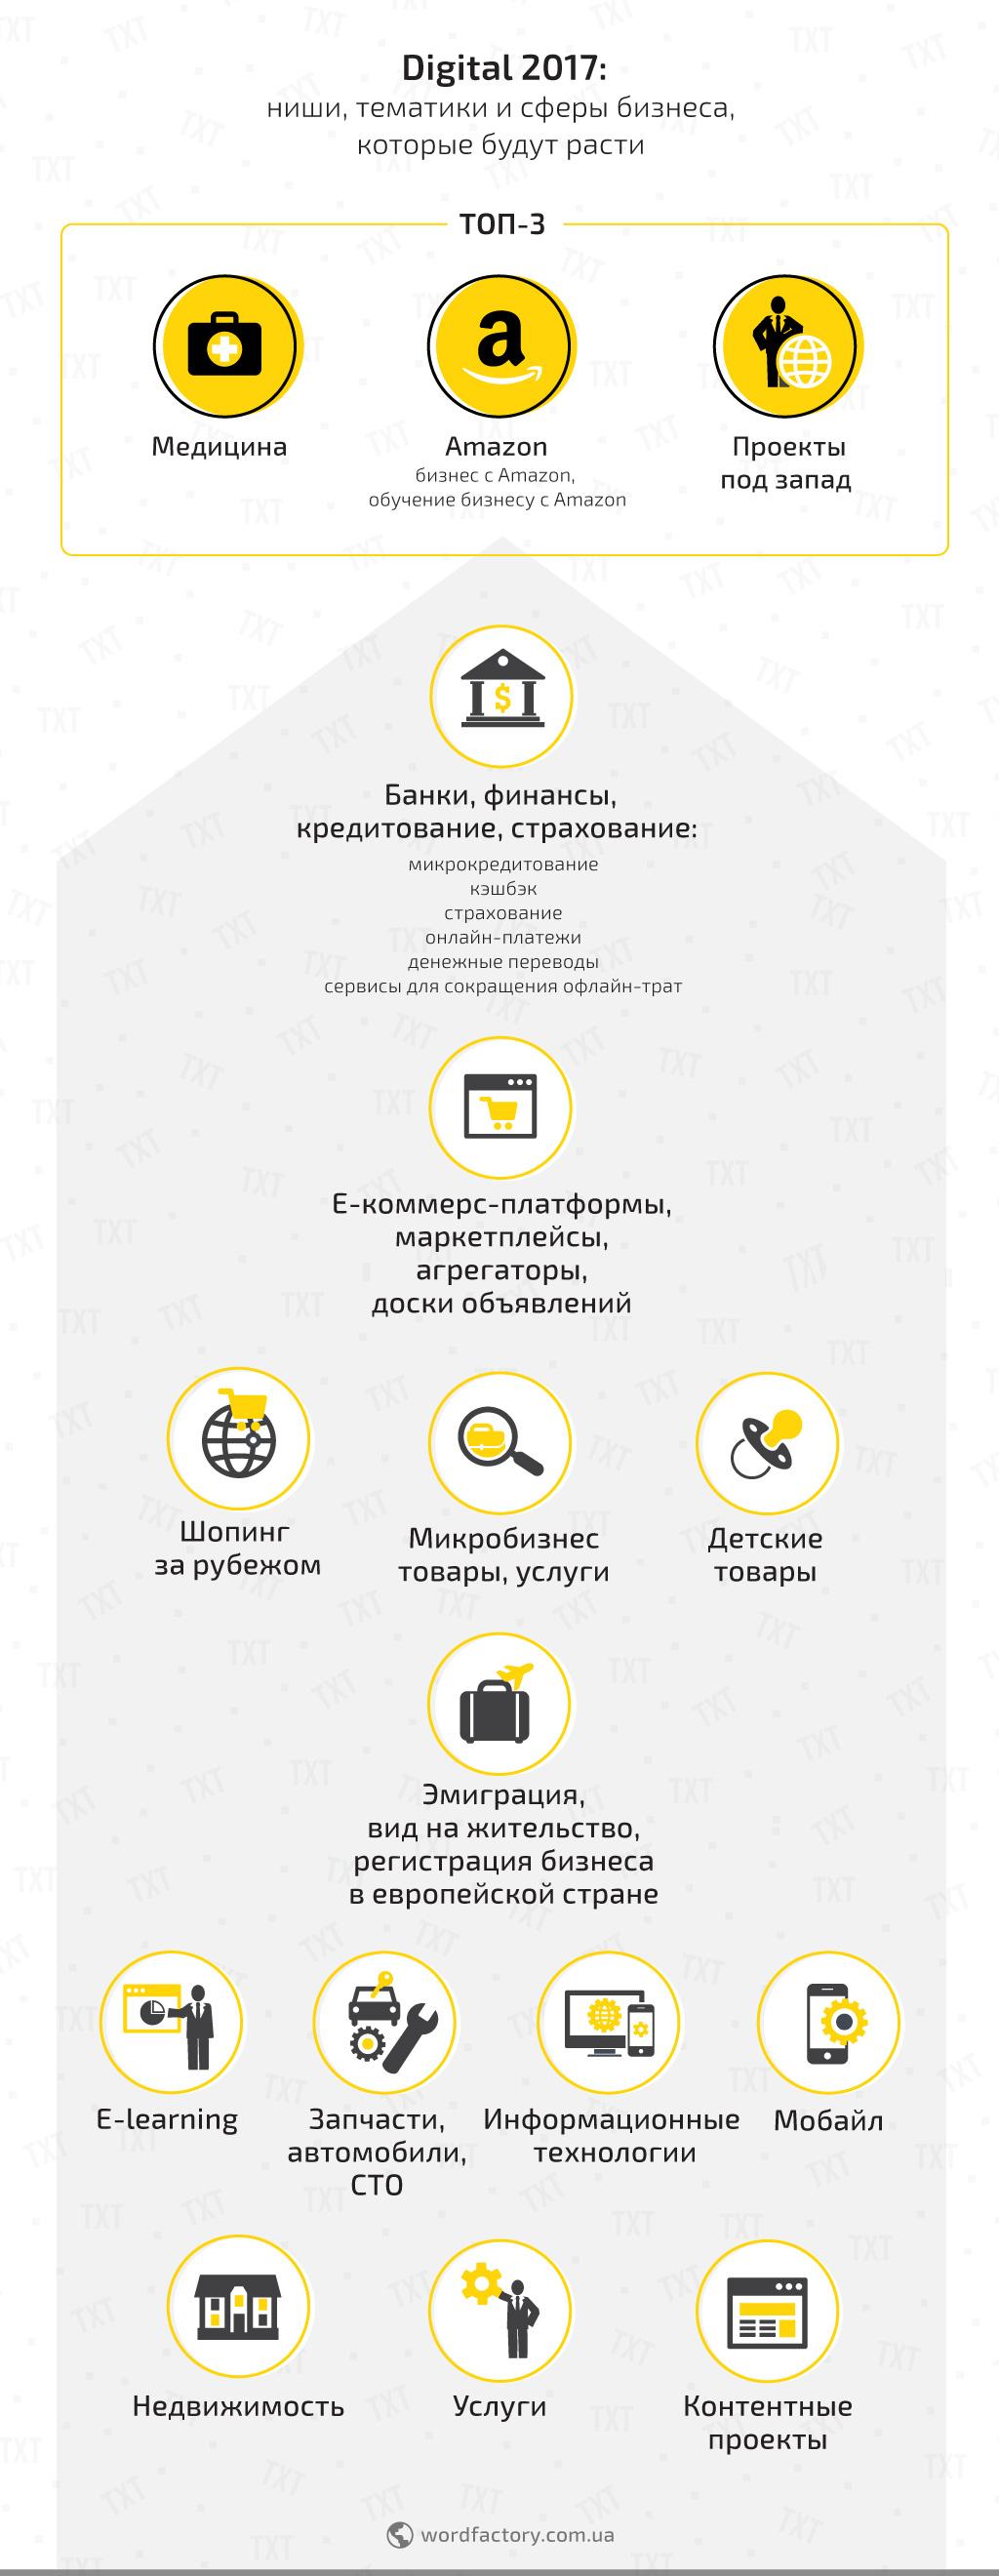 WF_infographic_30.12.2016 (2) (2) (1)